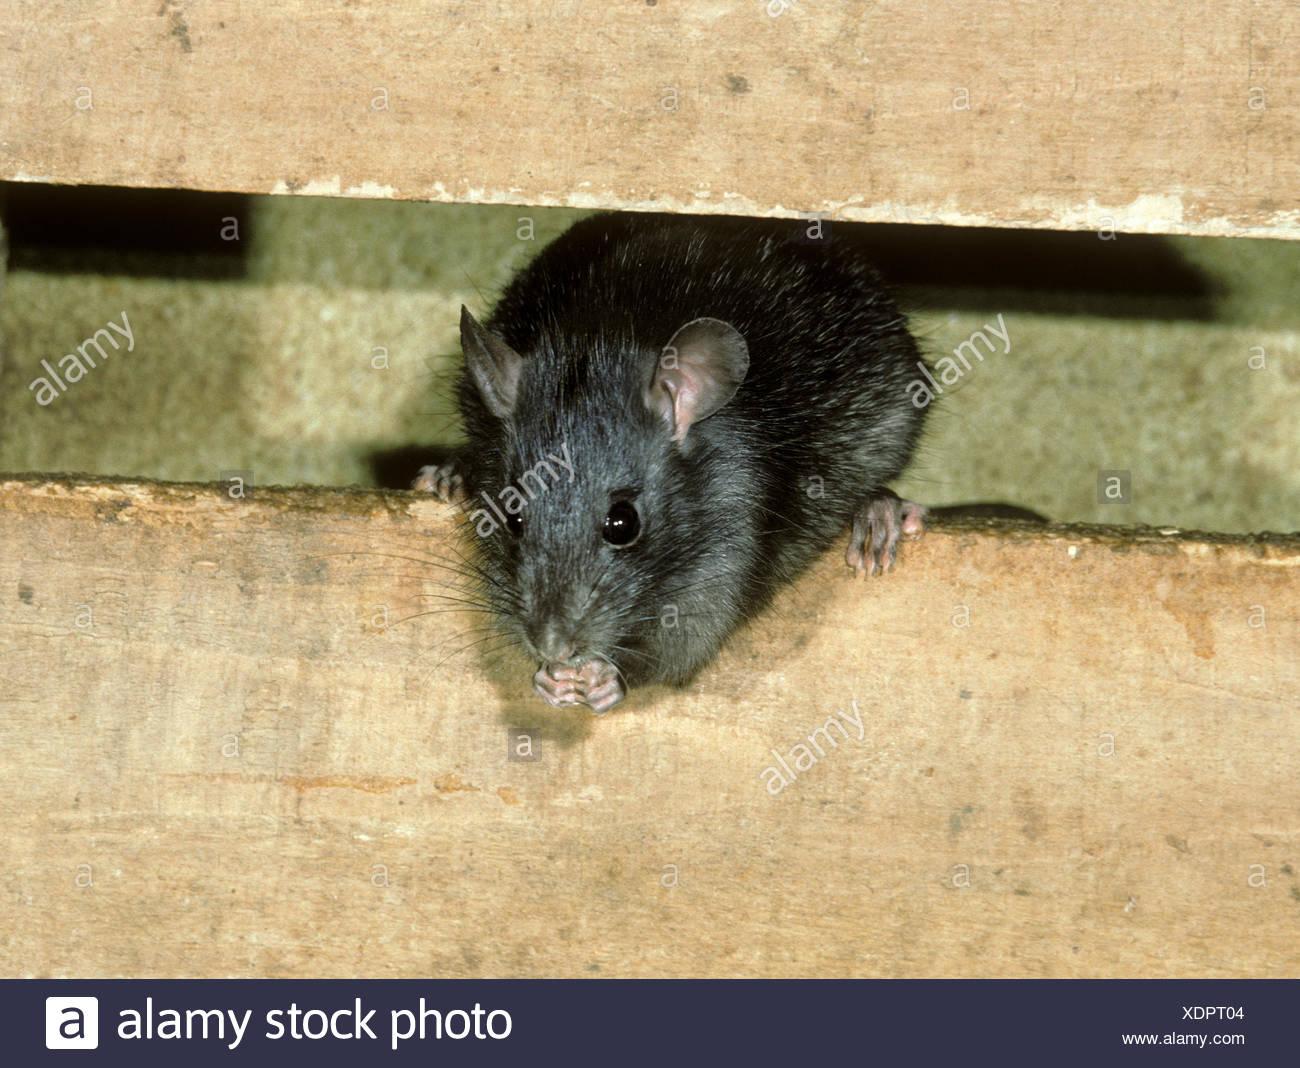 Black Rat - Rattus rattus - Stock Image